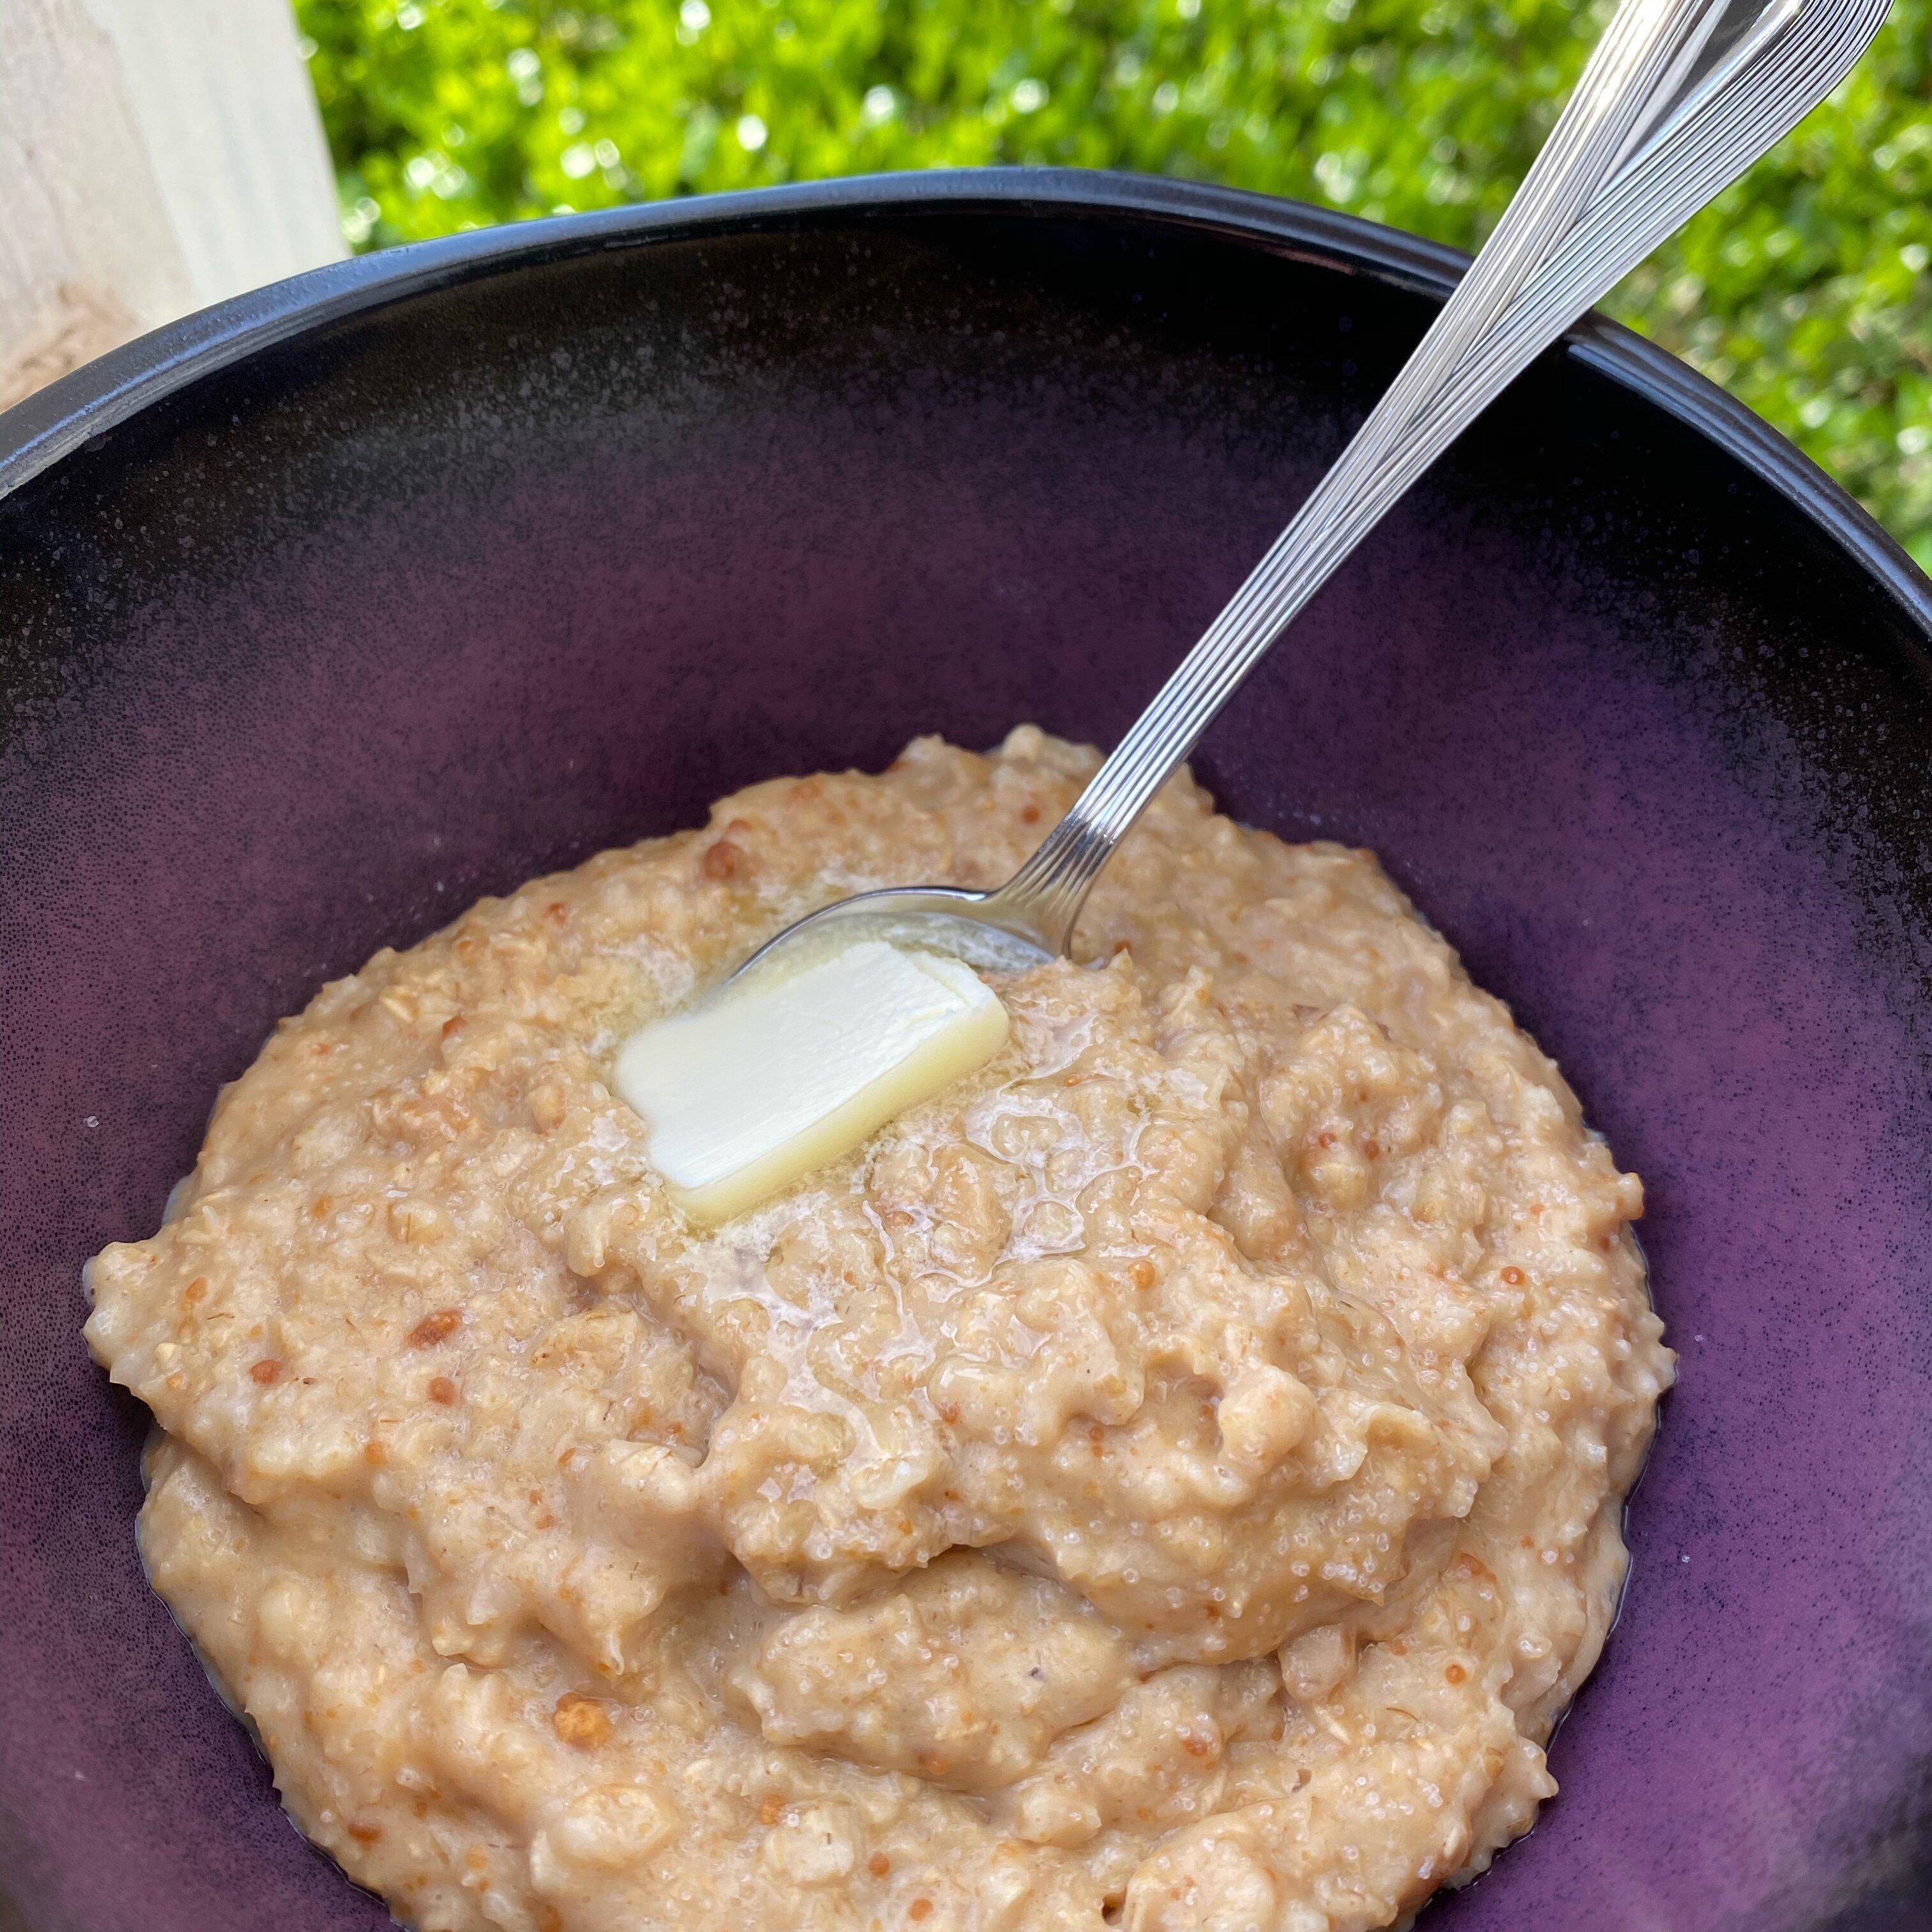 hannahs peanut butter oatmeal recipe